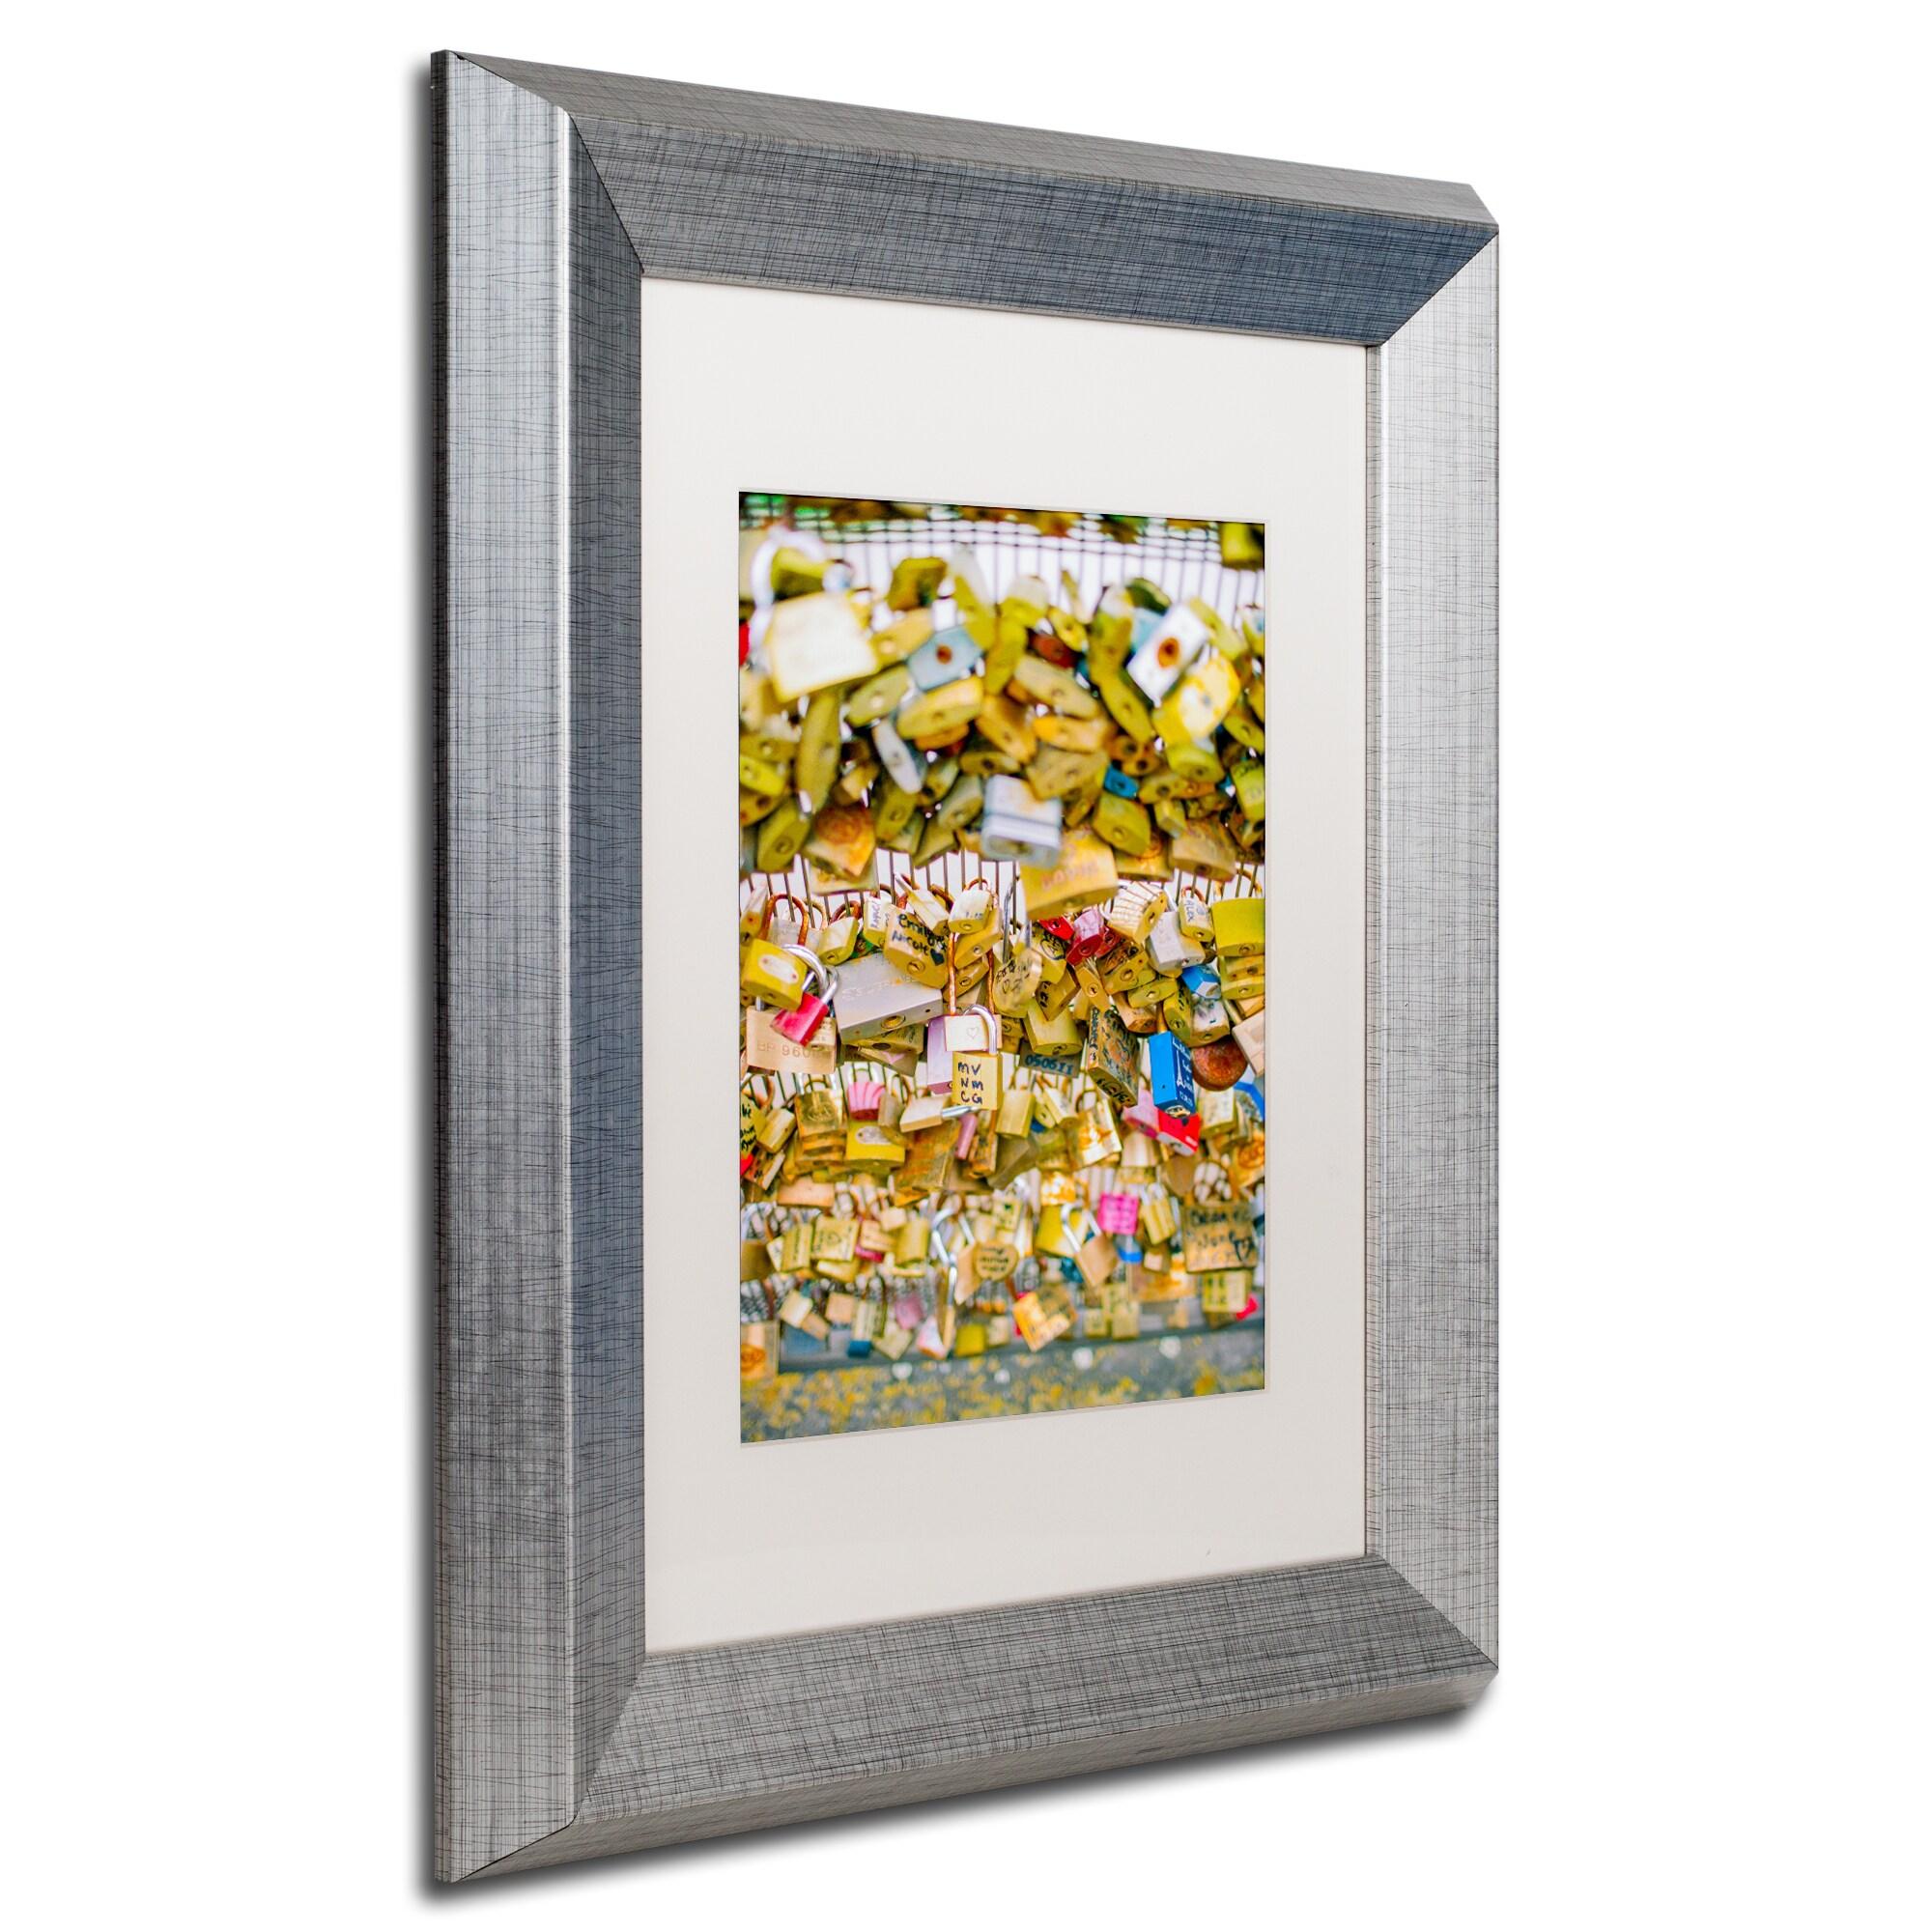 Ariane Moshayedi Paris Locks Love Matted Framed Art Overstock 12390812